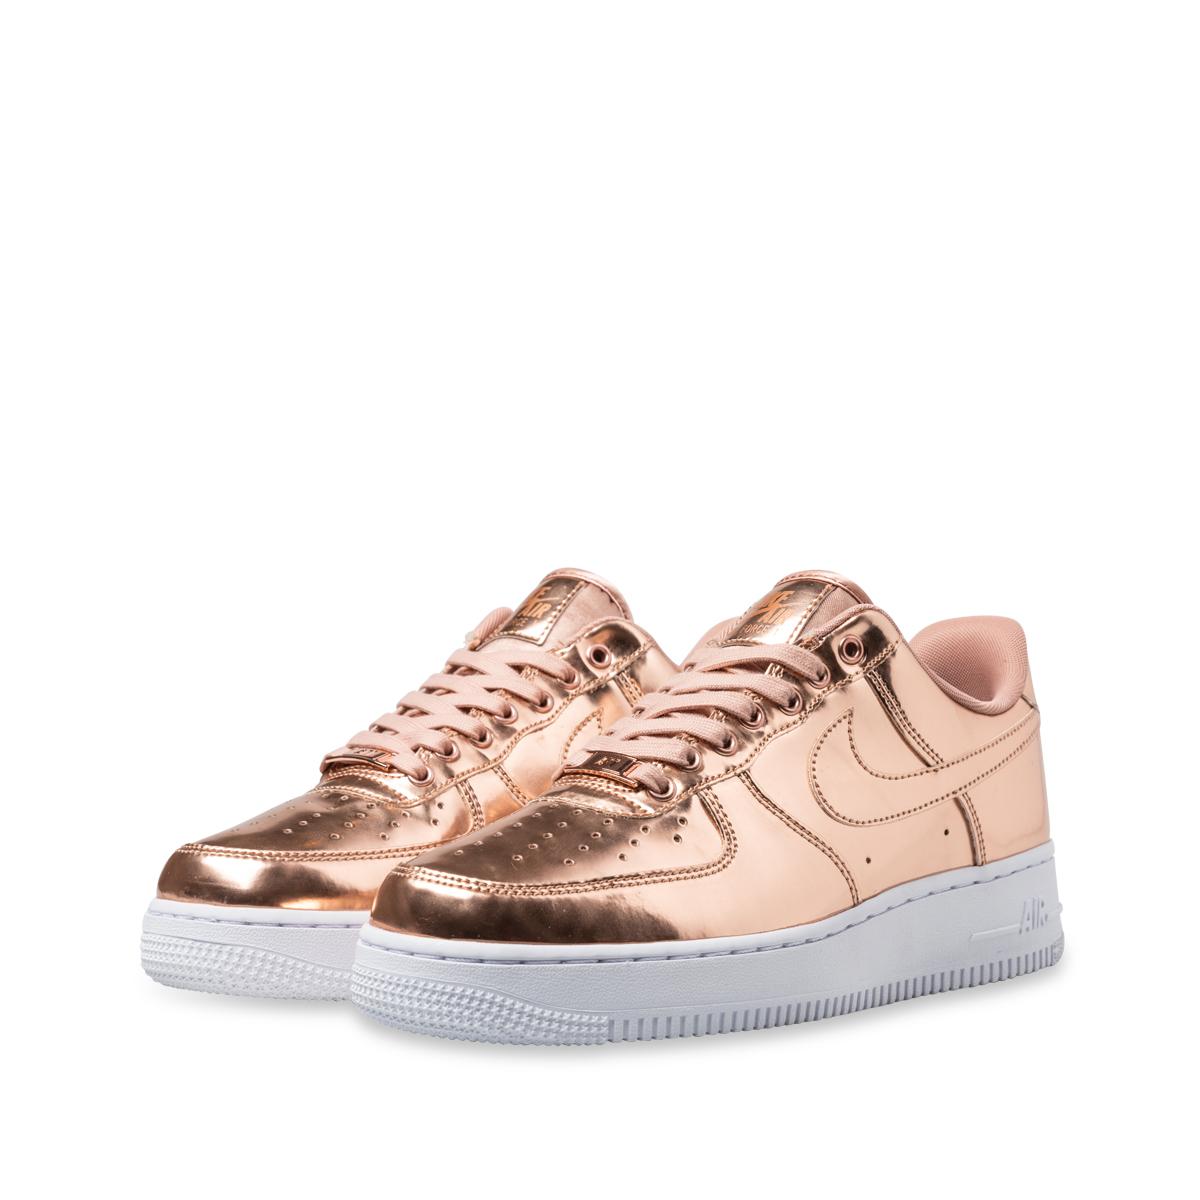 Nike Womens Air Force 1 SP